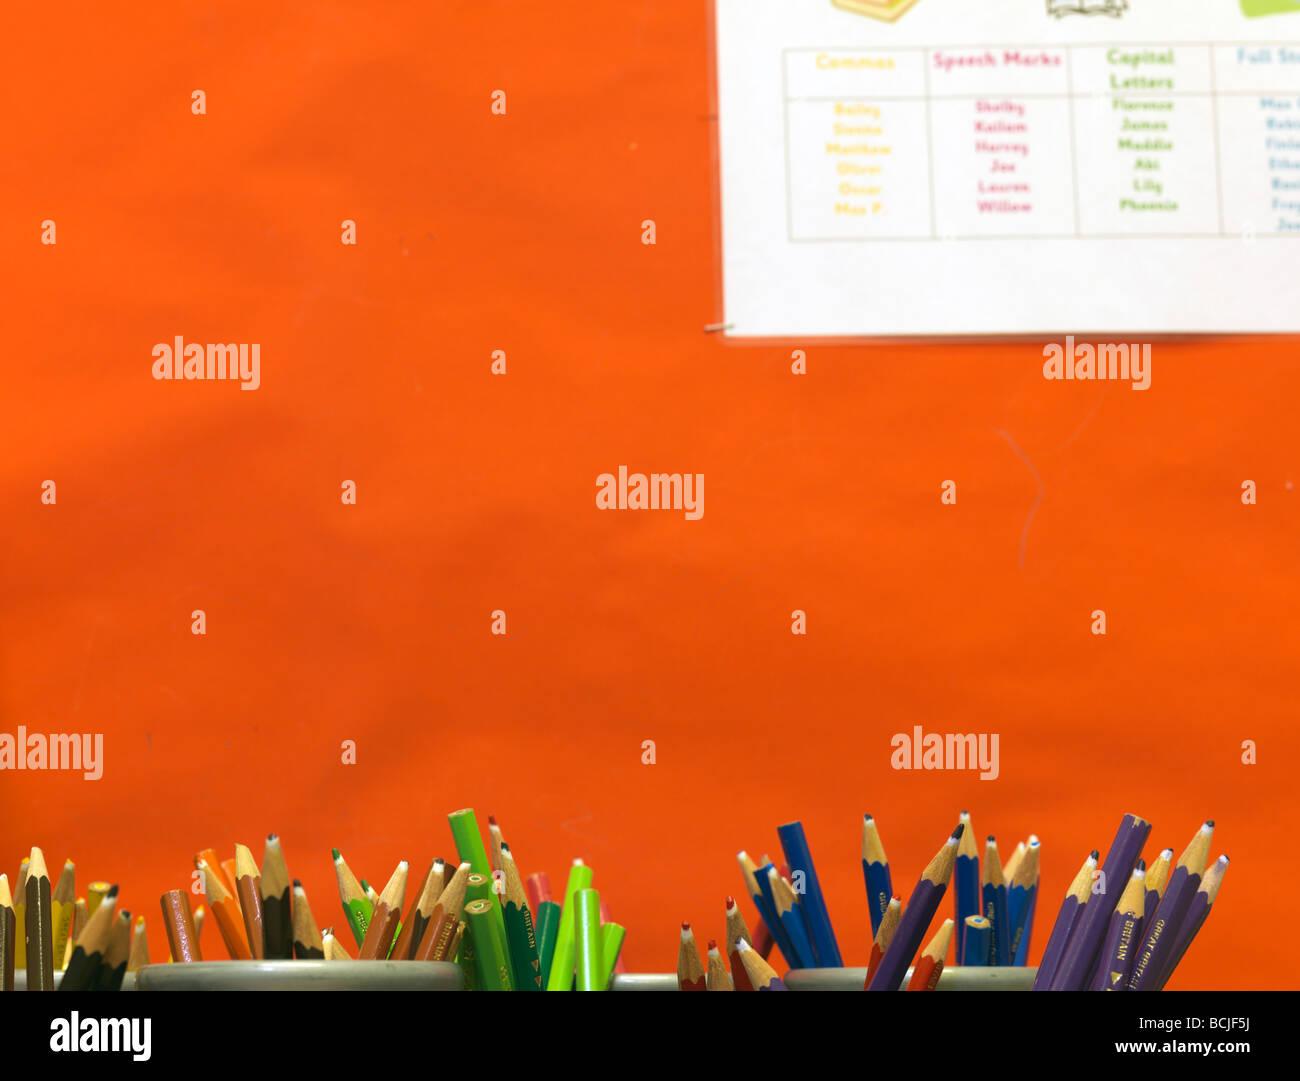 colored pencils in school pots - Stock Image